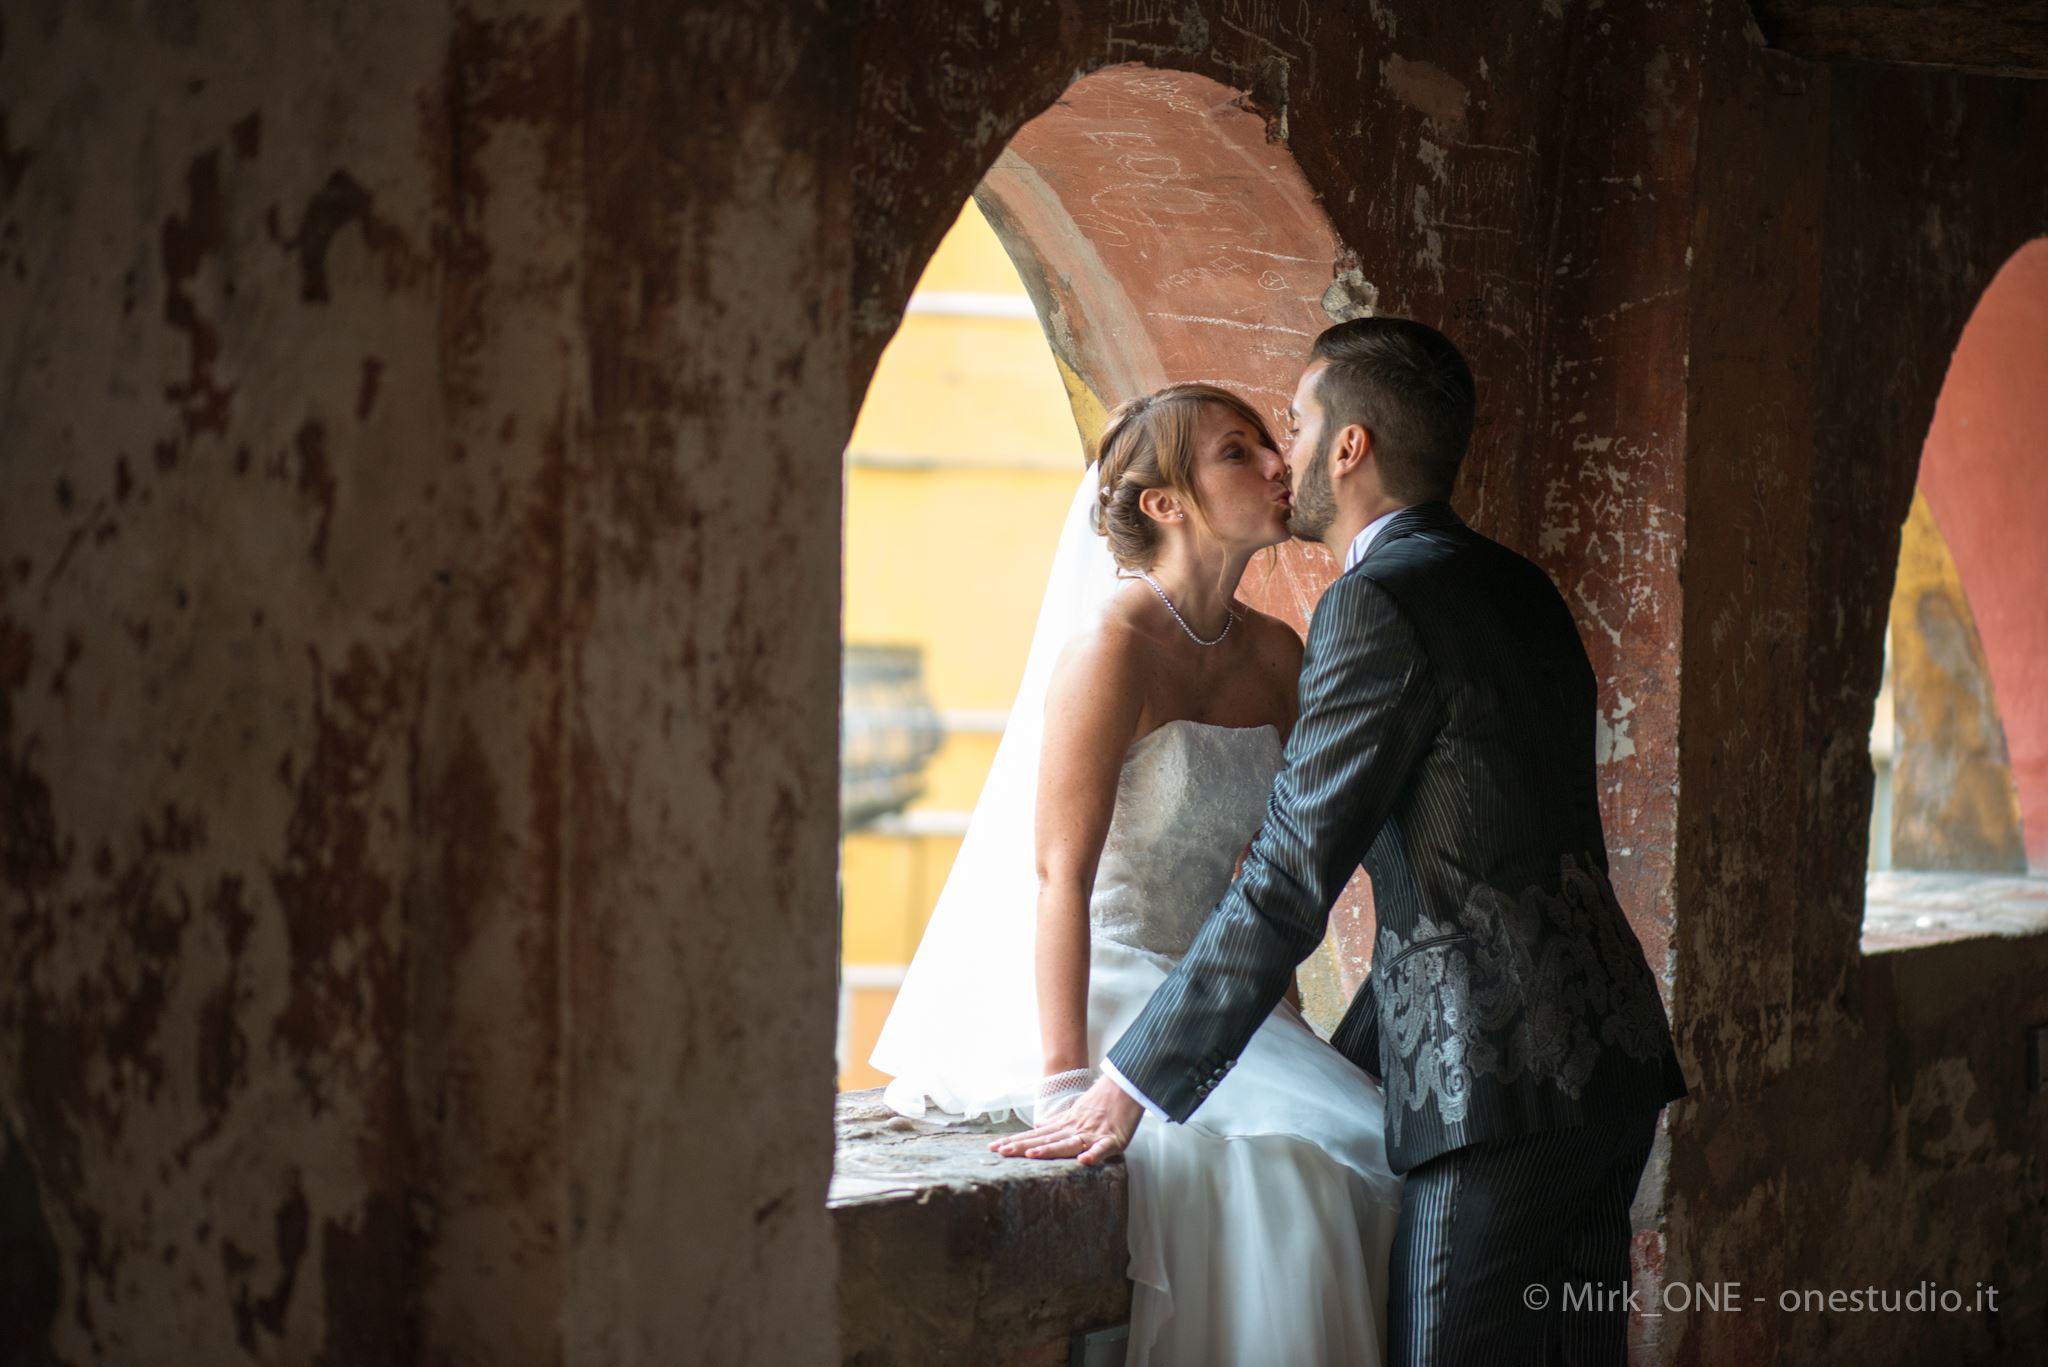 https://lnx.mirkone.it/wp-content/uploads/2015/07/mirk_ONE-fotografo-matrimonio-00833.jpg